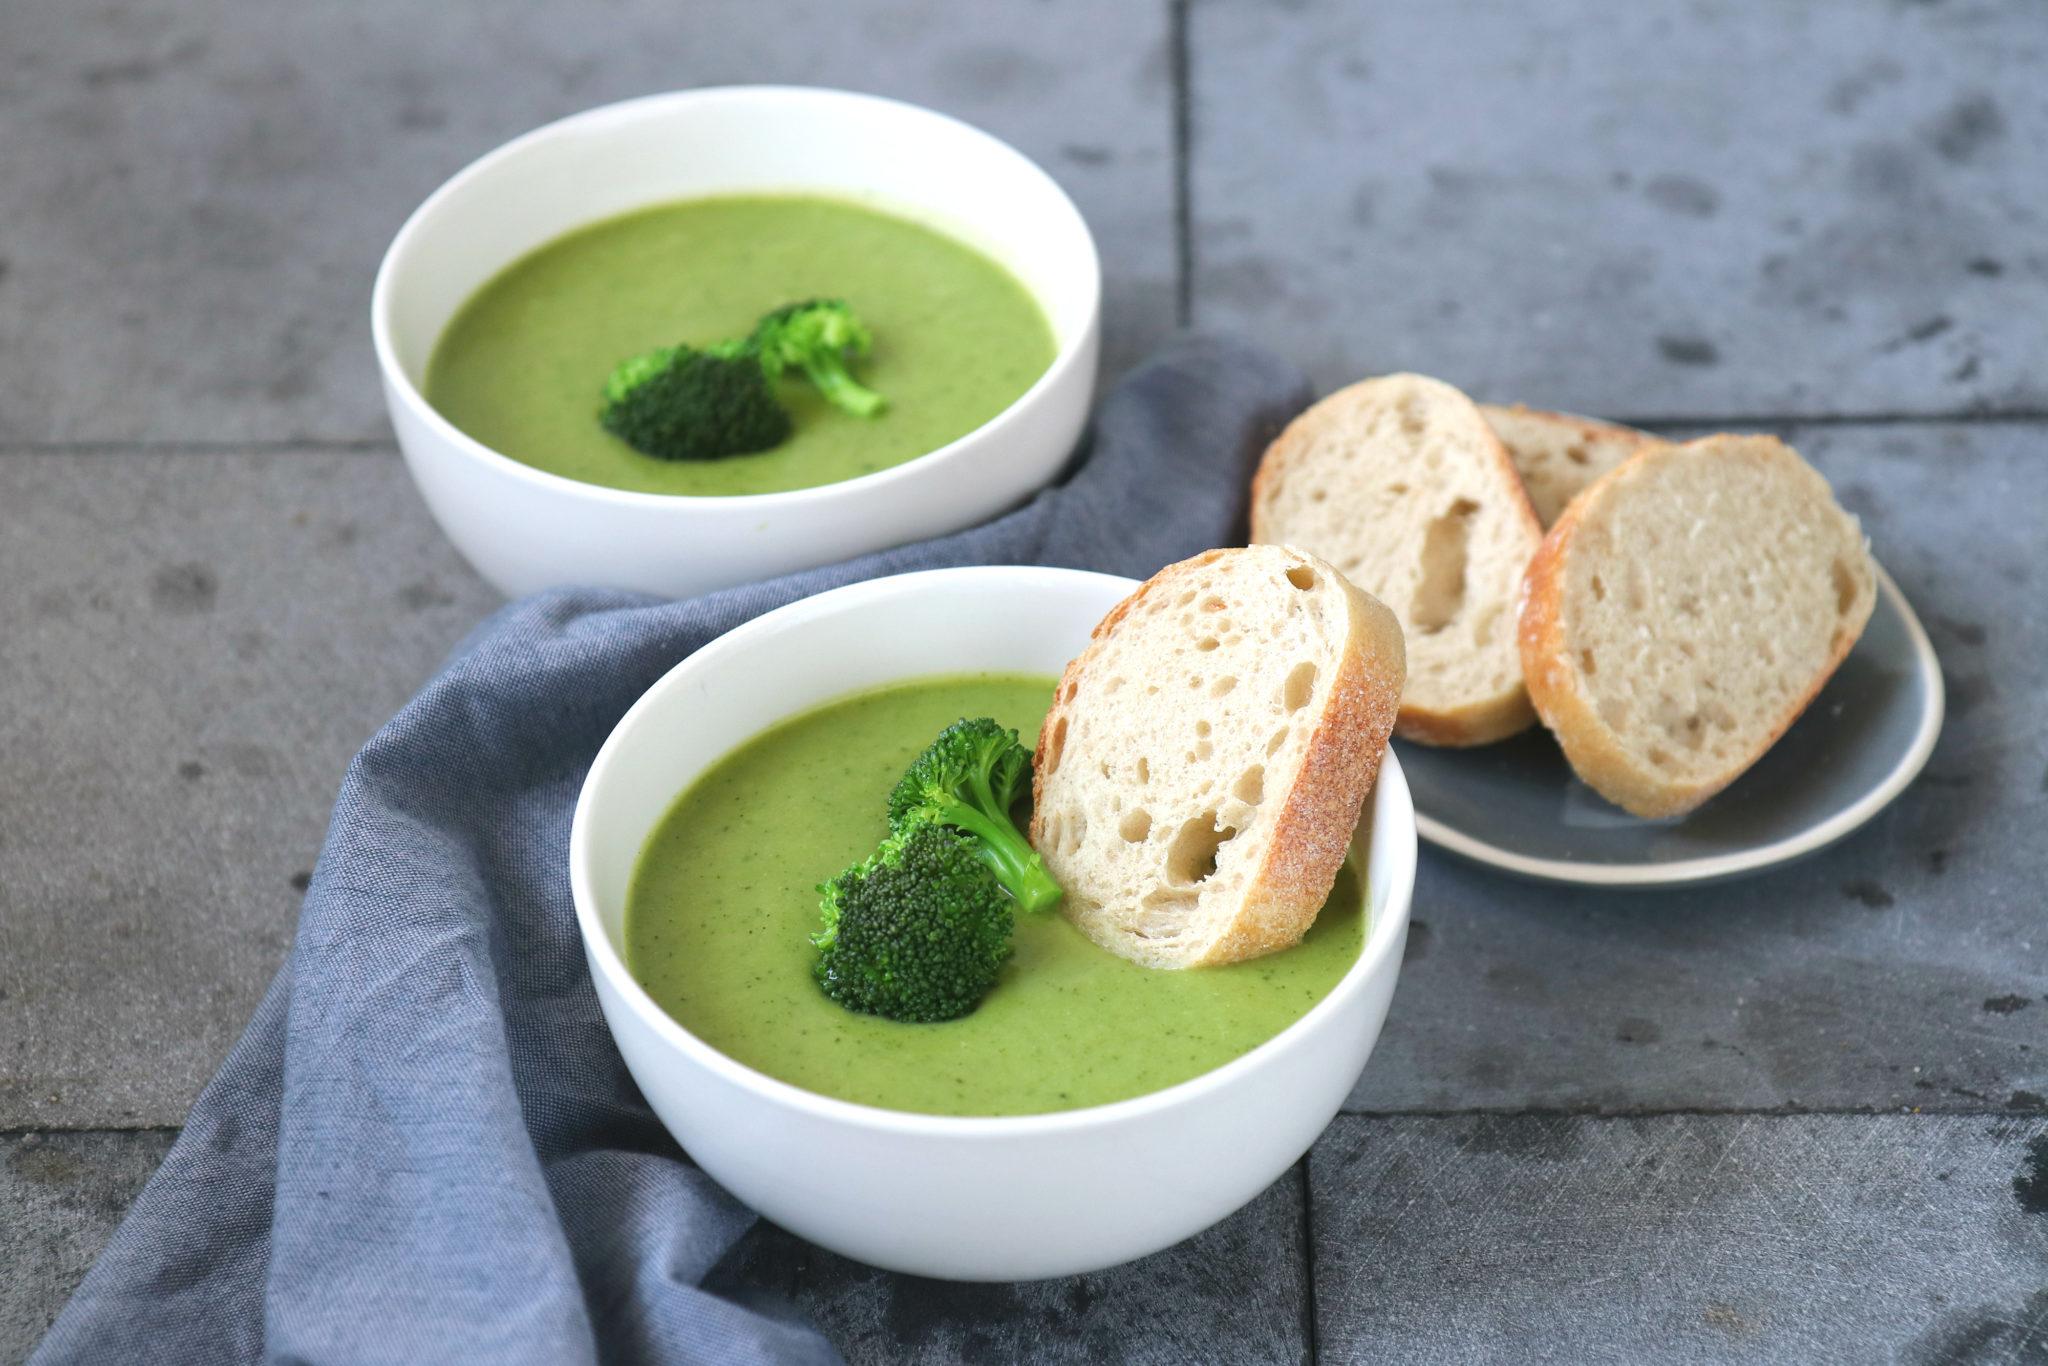 Recept courgette en broccoli soep www.jaimyskitchen.nl